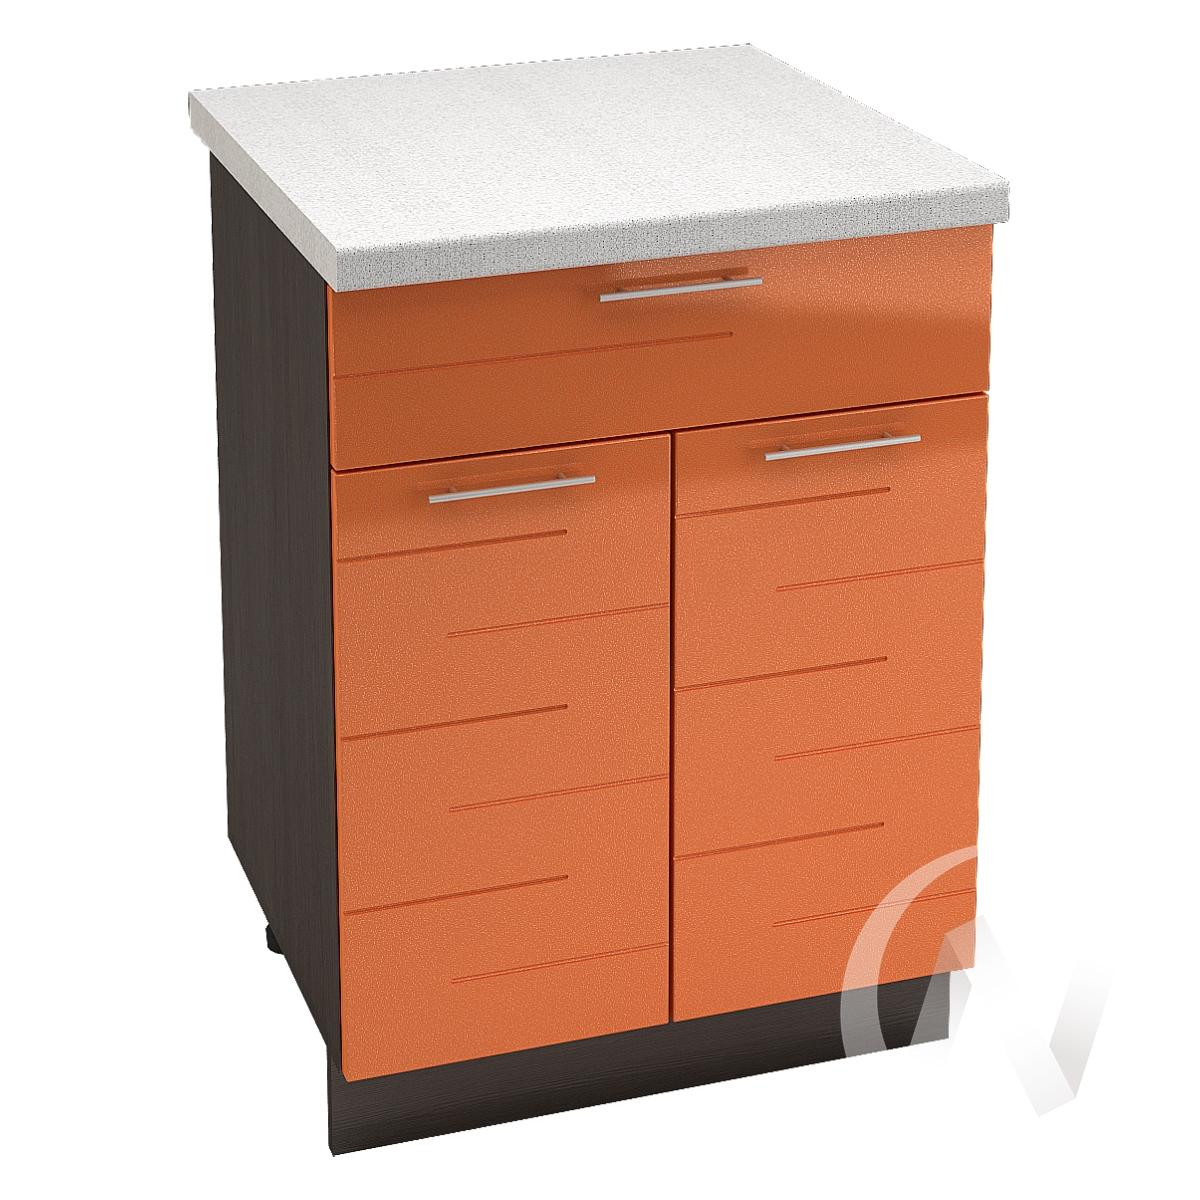 "Кухня ""Техно"": Шкаф нижний с ящиком 600, ШН1Я 600 М (корпус венге)"